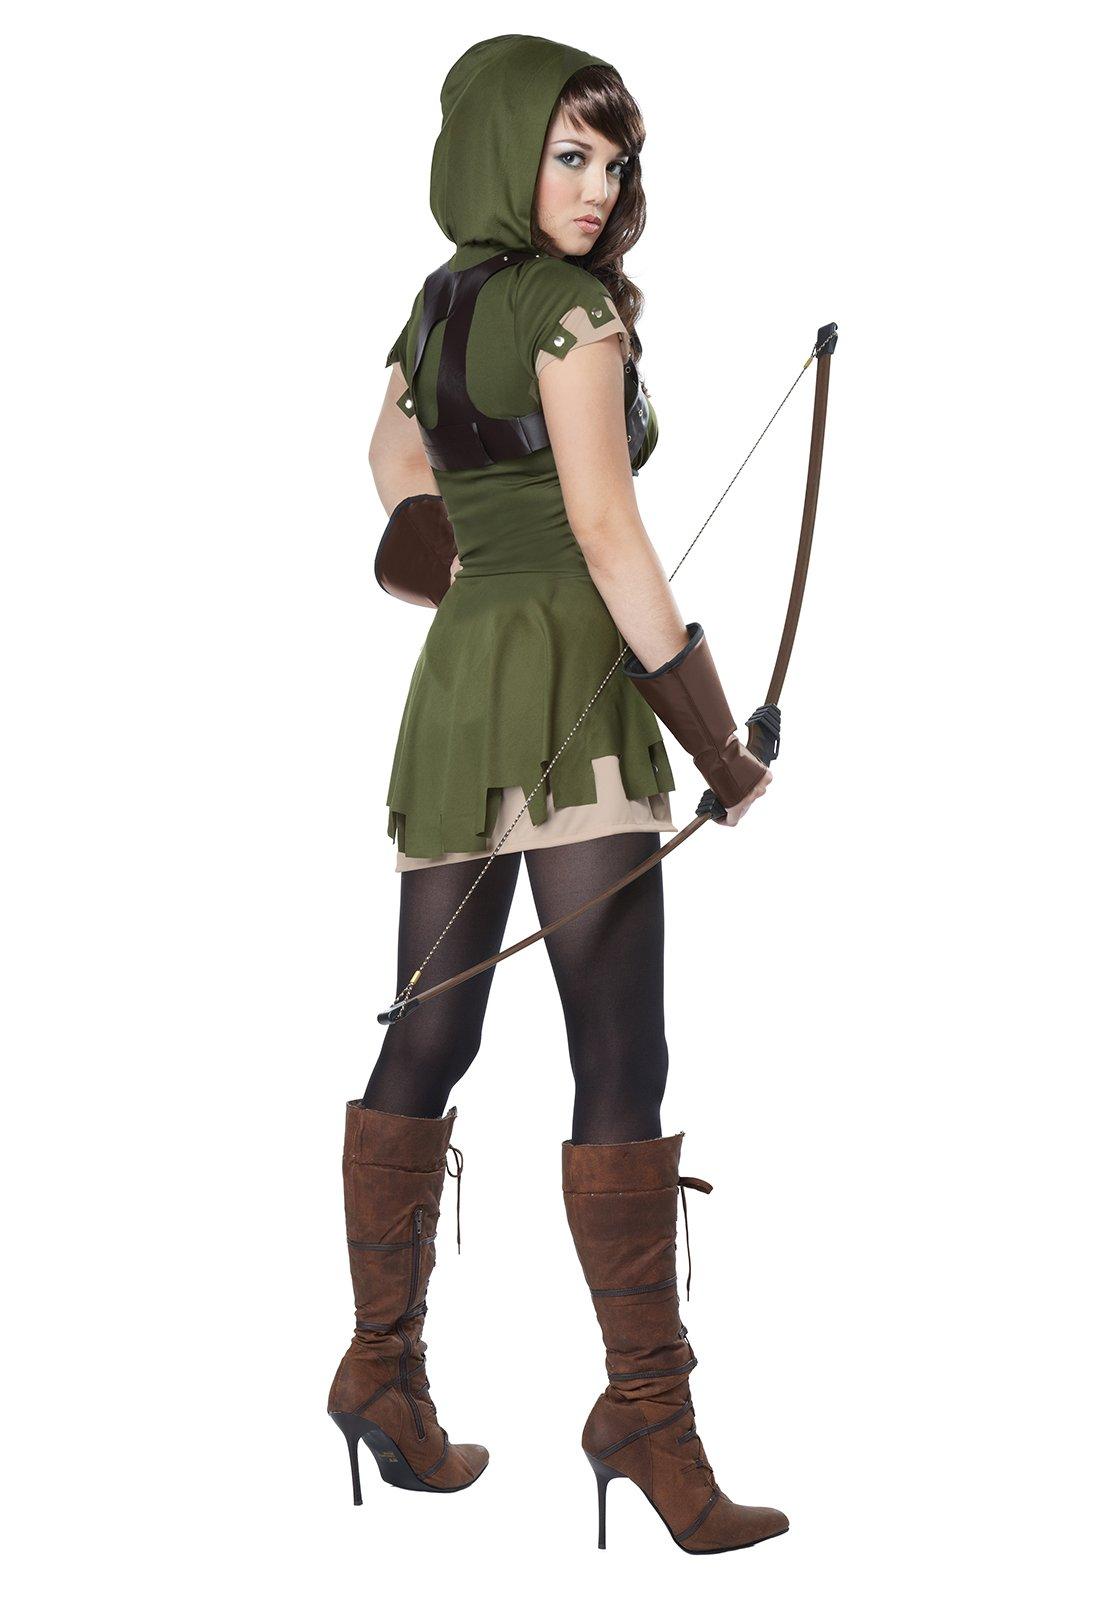 California Costumes 01358 Adult Lady Robin Hood